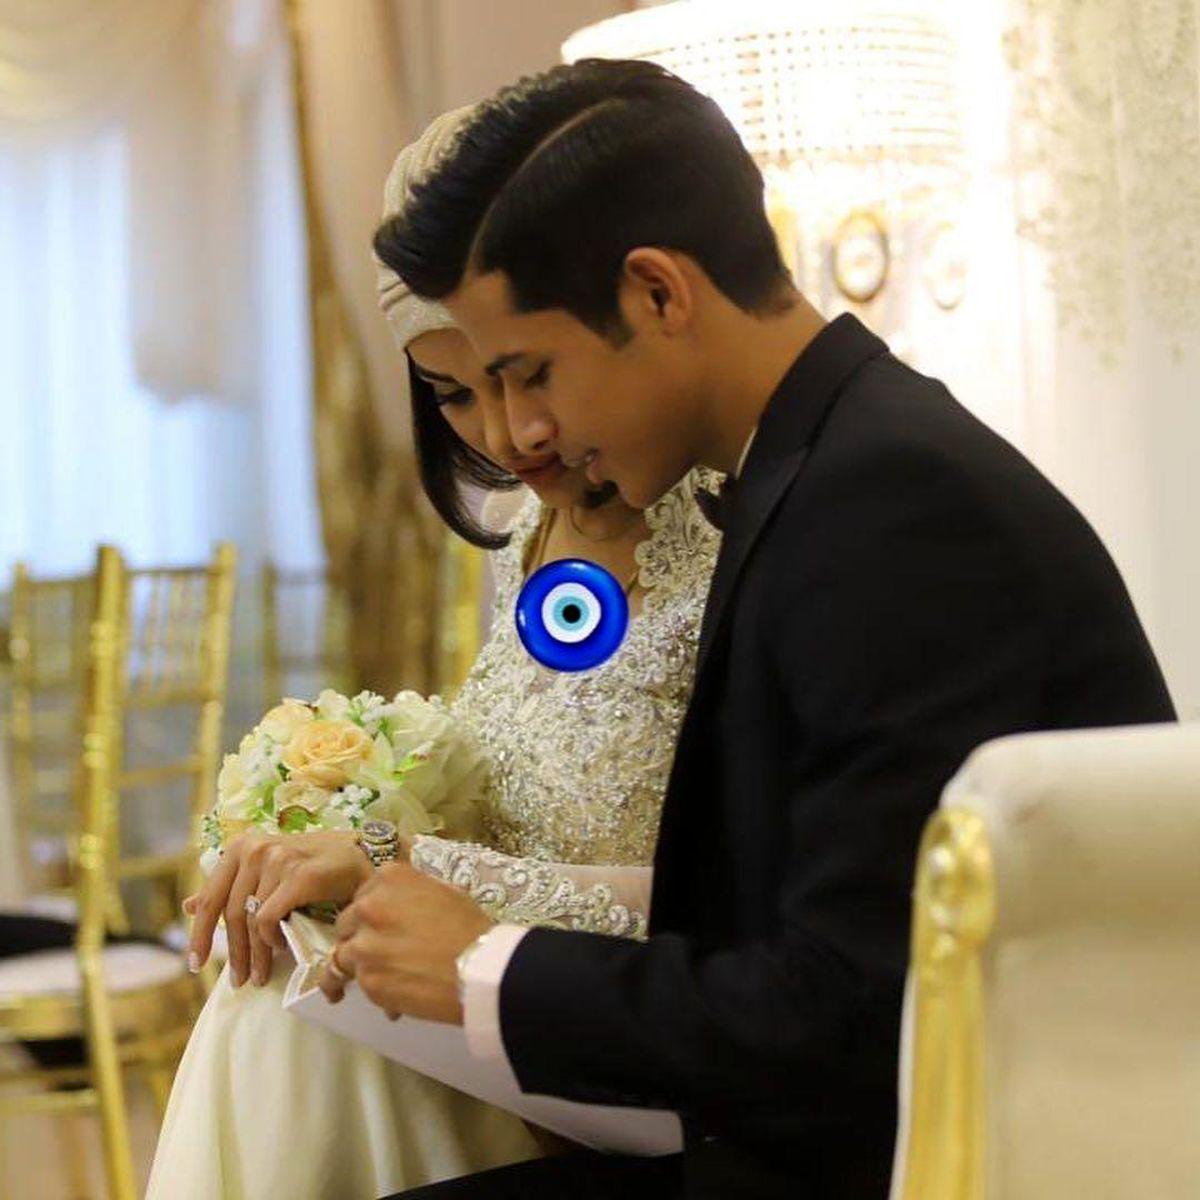 مراسم-عروسی-لاکچری-مهدی-قائدی-همسرش--عکس-57417